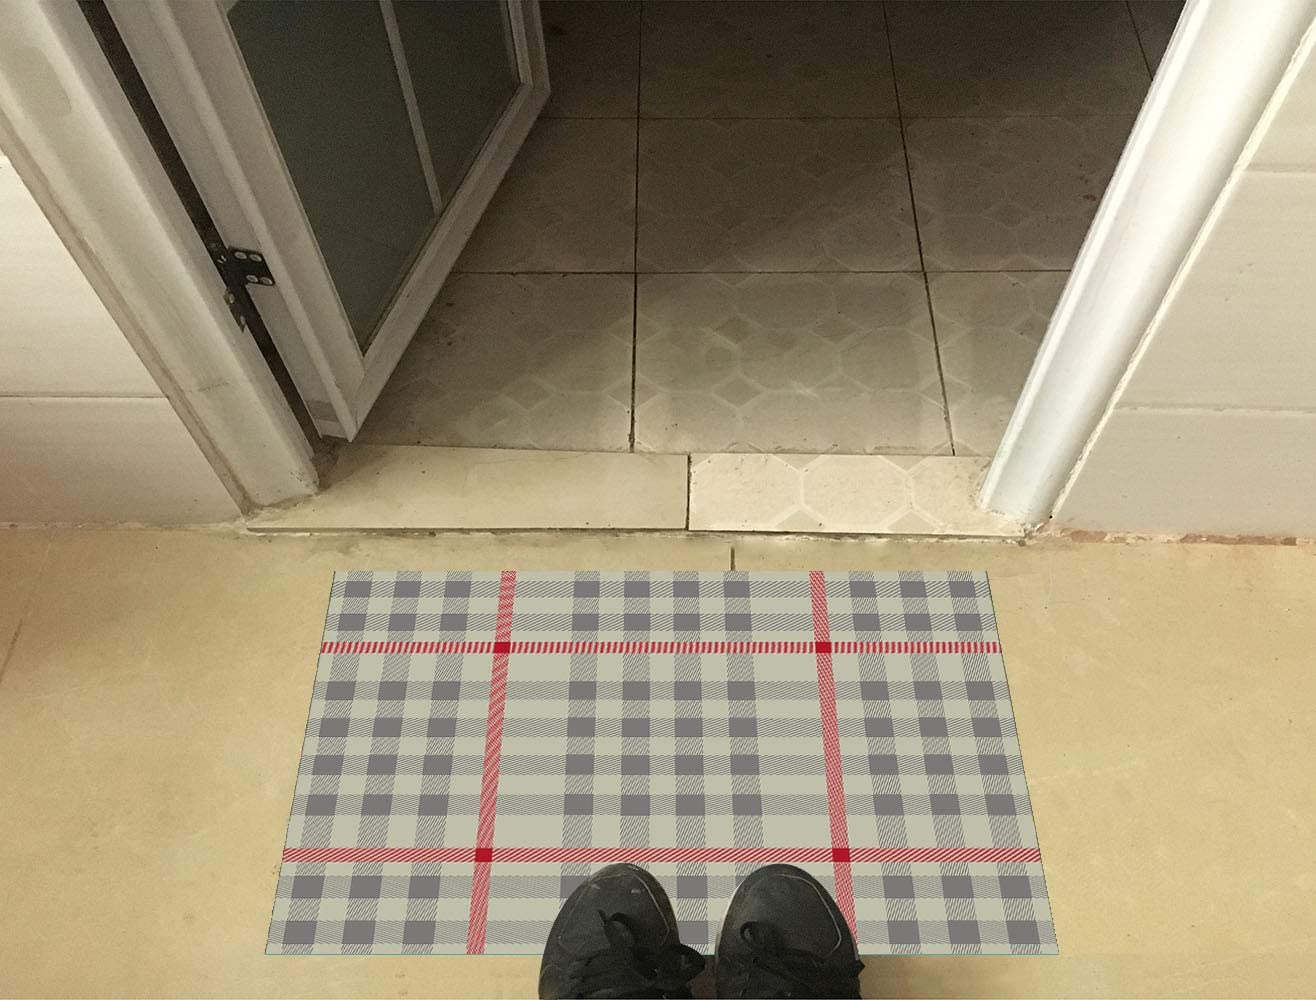 DayliPillow Welcome Doormat Did You Call First Front Door Mat Home Decor Indoor Mats for Entry Floor Mats